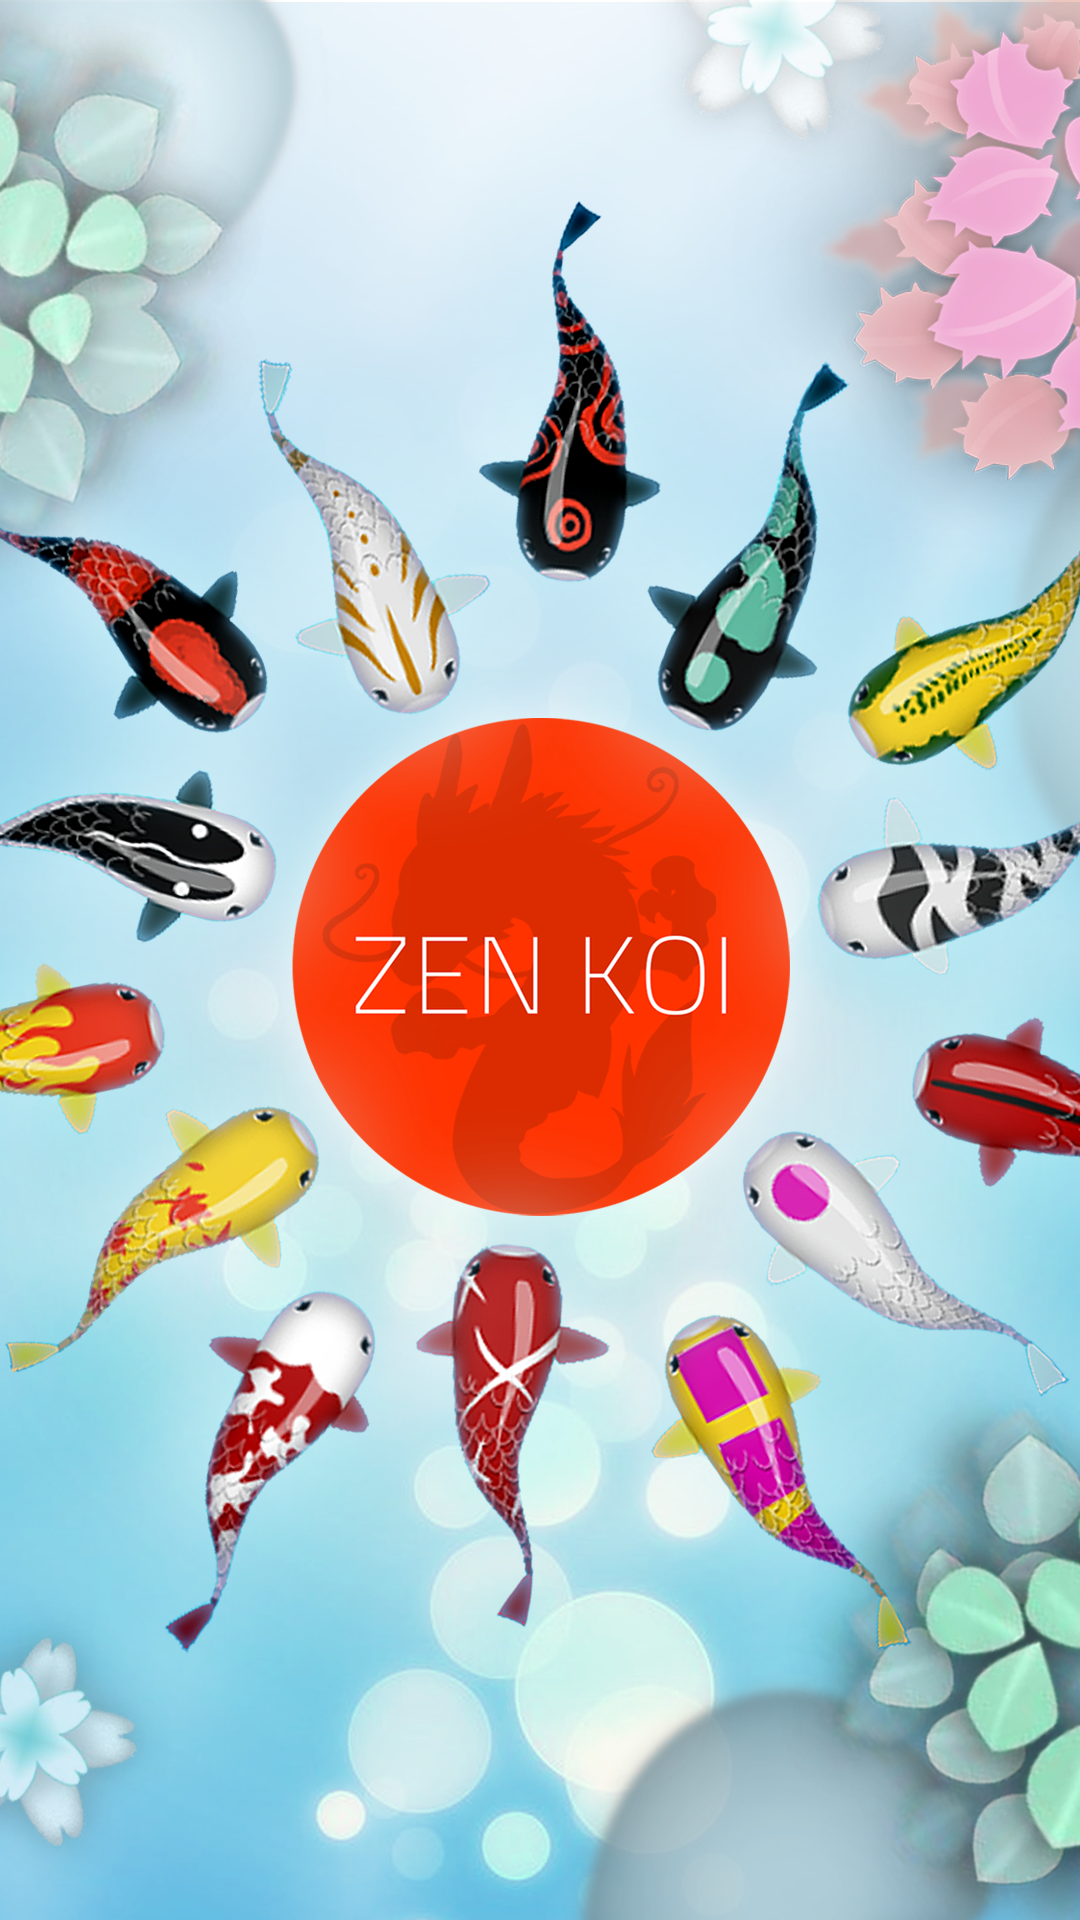 Amazon.com: Zen Koi: Appstore for Android